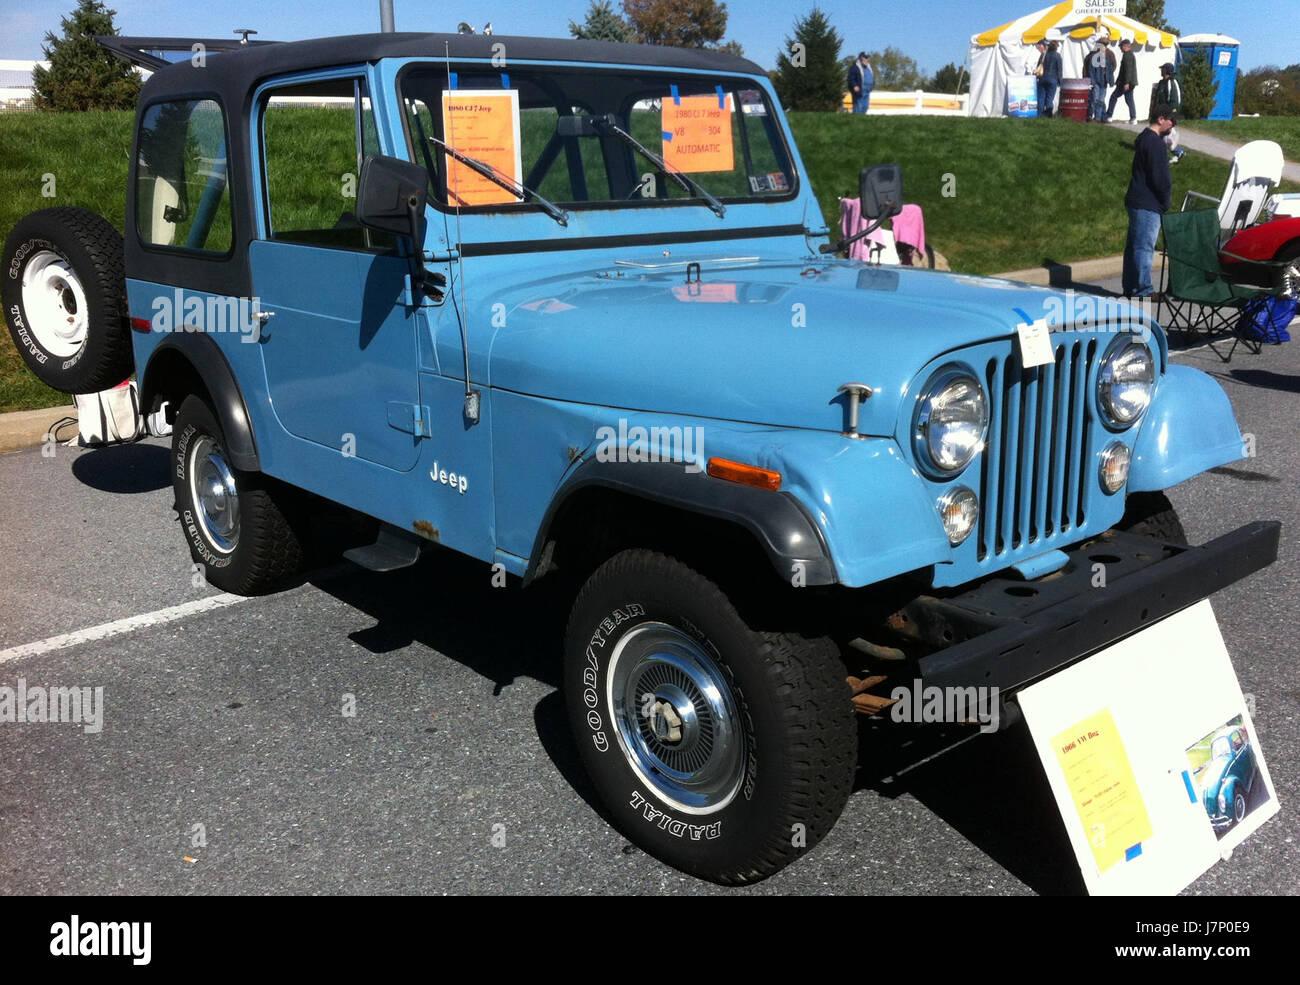 hight resolution of 1980 jeep cj 7 blue v8 automatic hershey 2012 stock photo 142468881